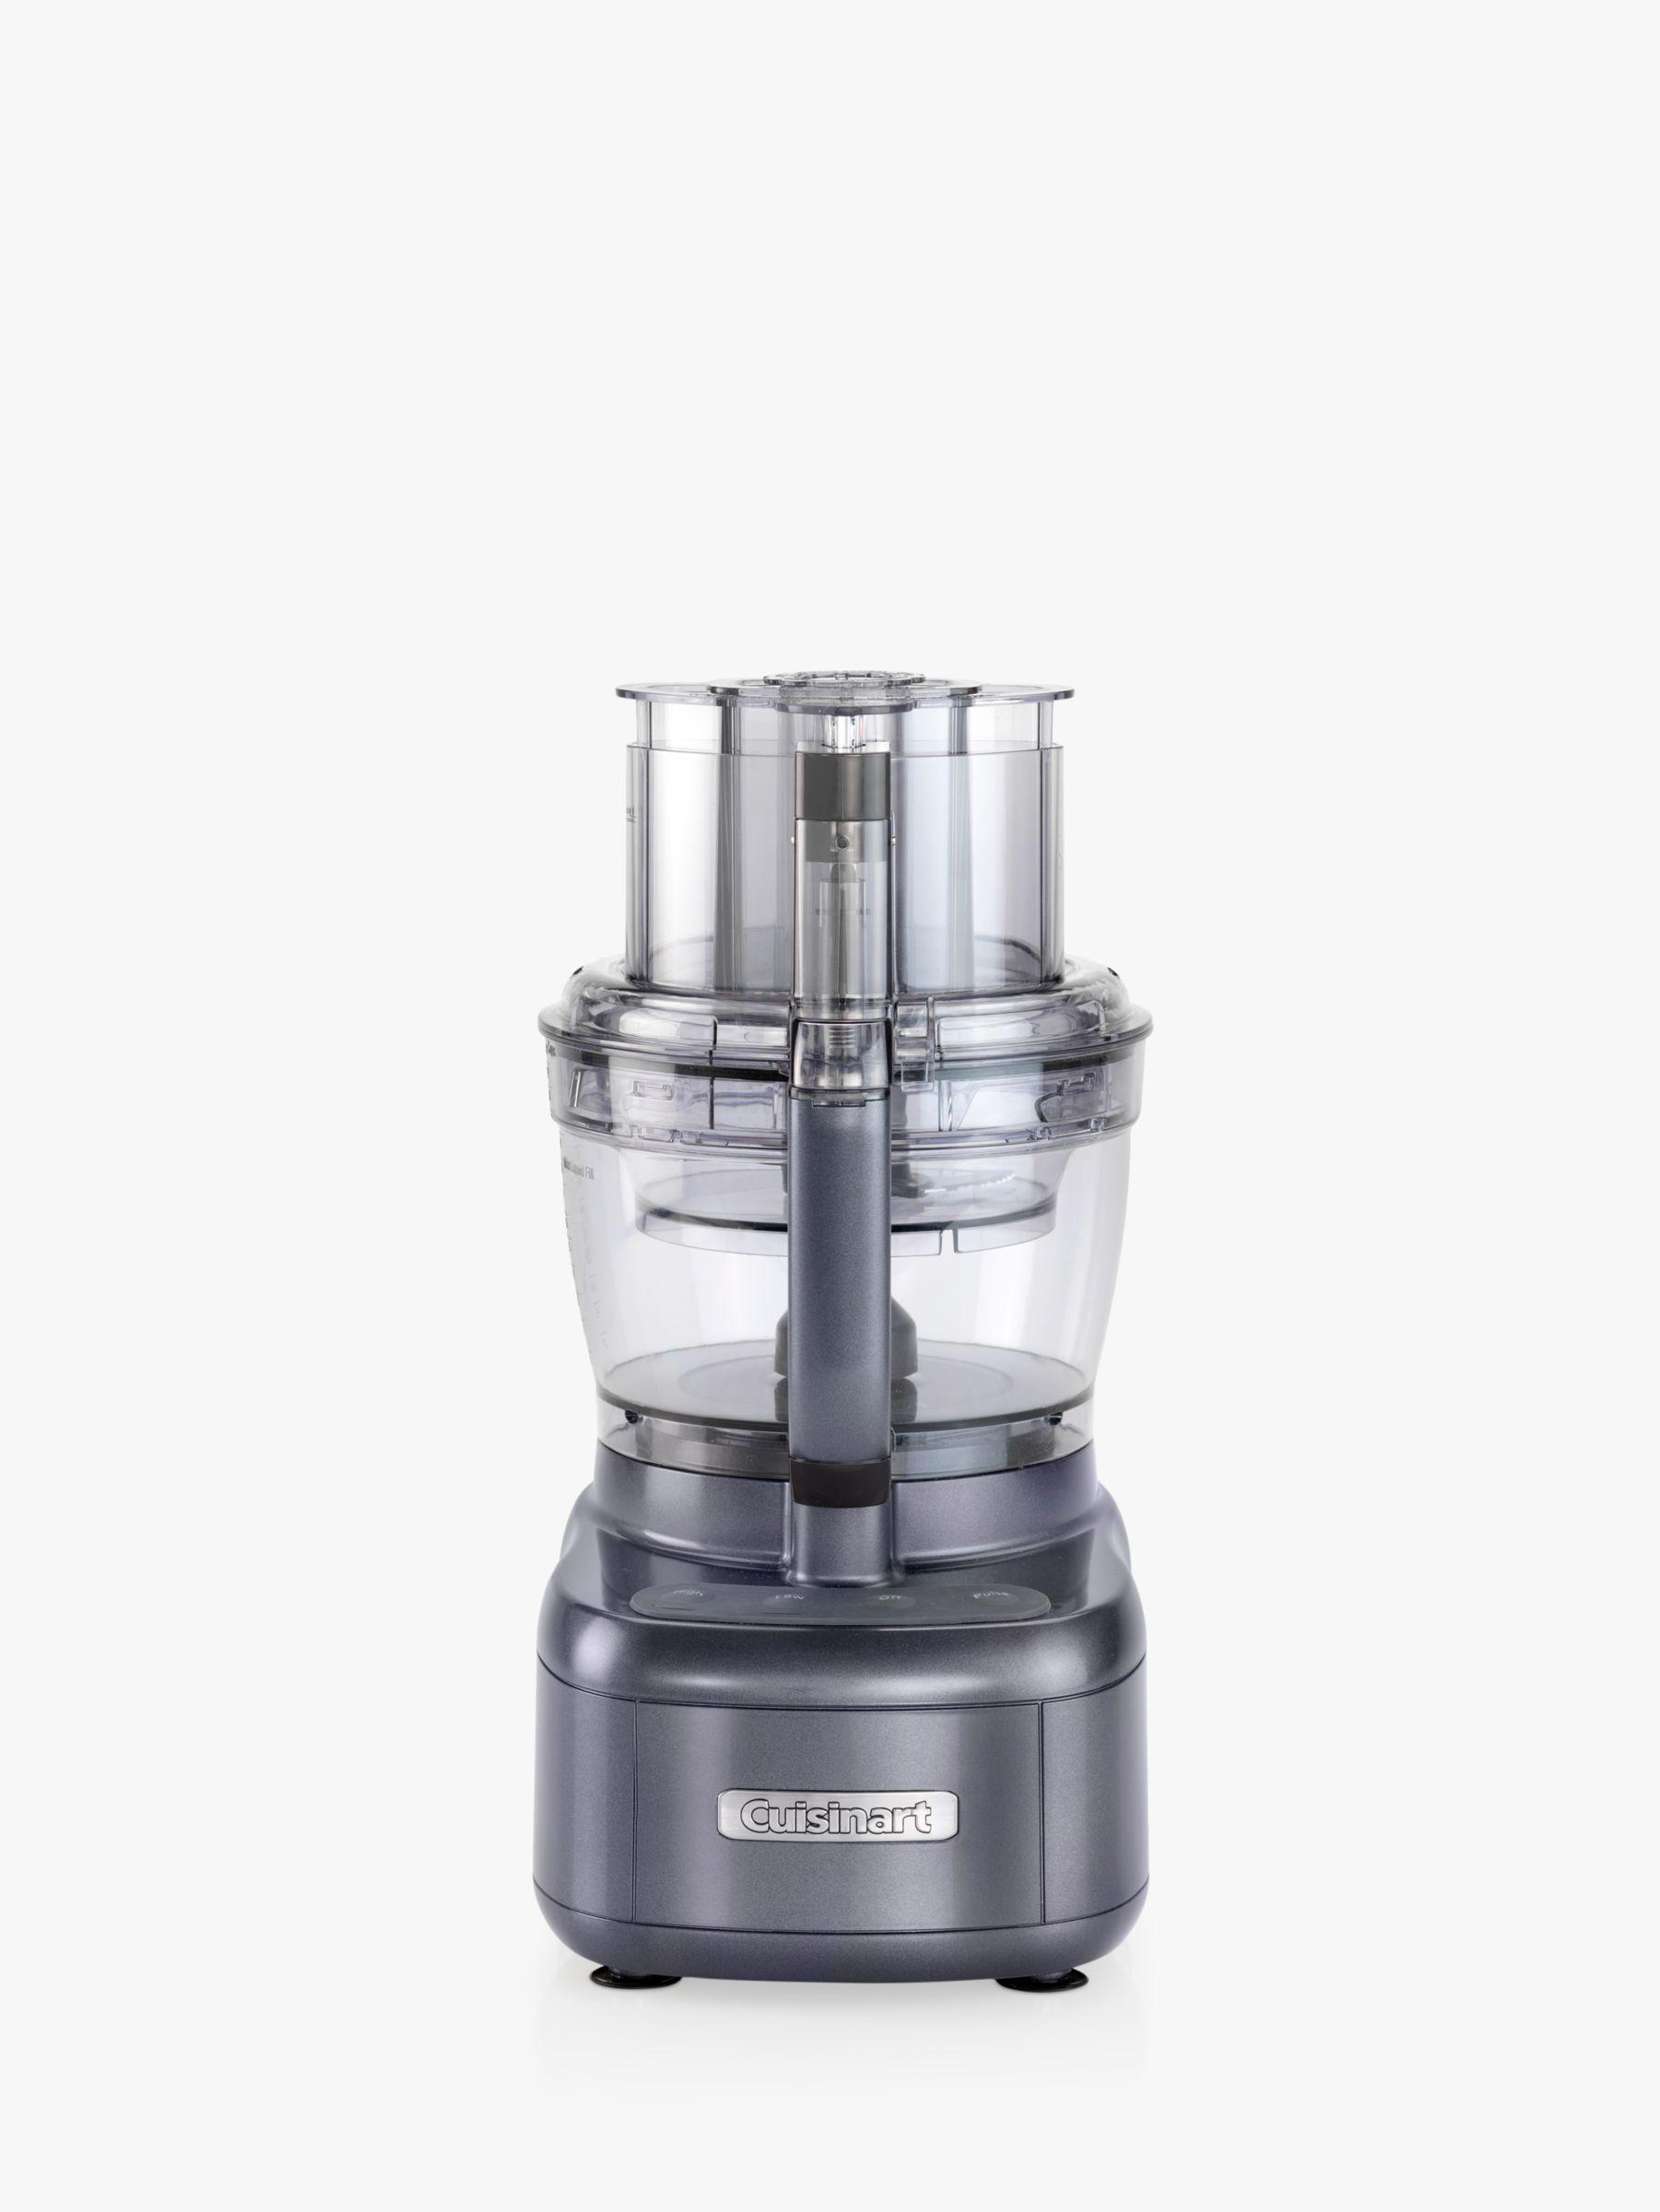 Cuisinart Cuisinart FP1300U Expert Prep Pro Food Processor, Midnight Grey